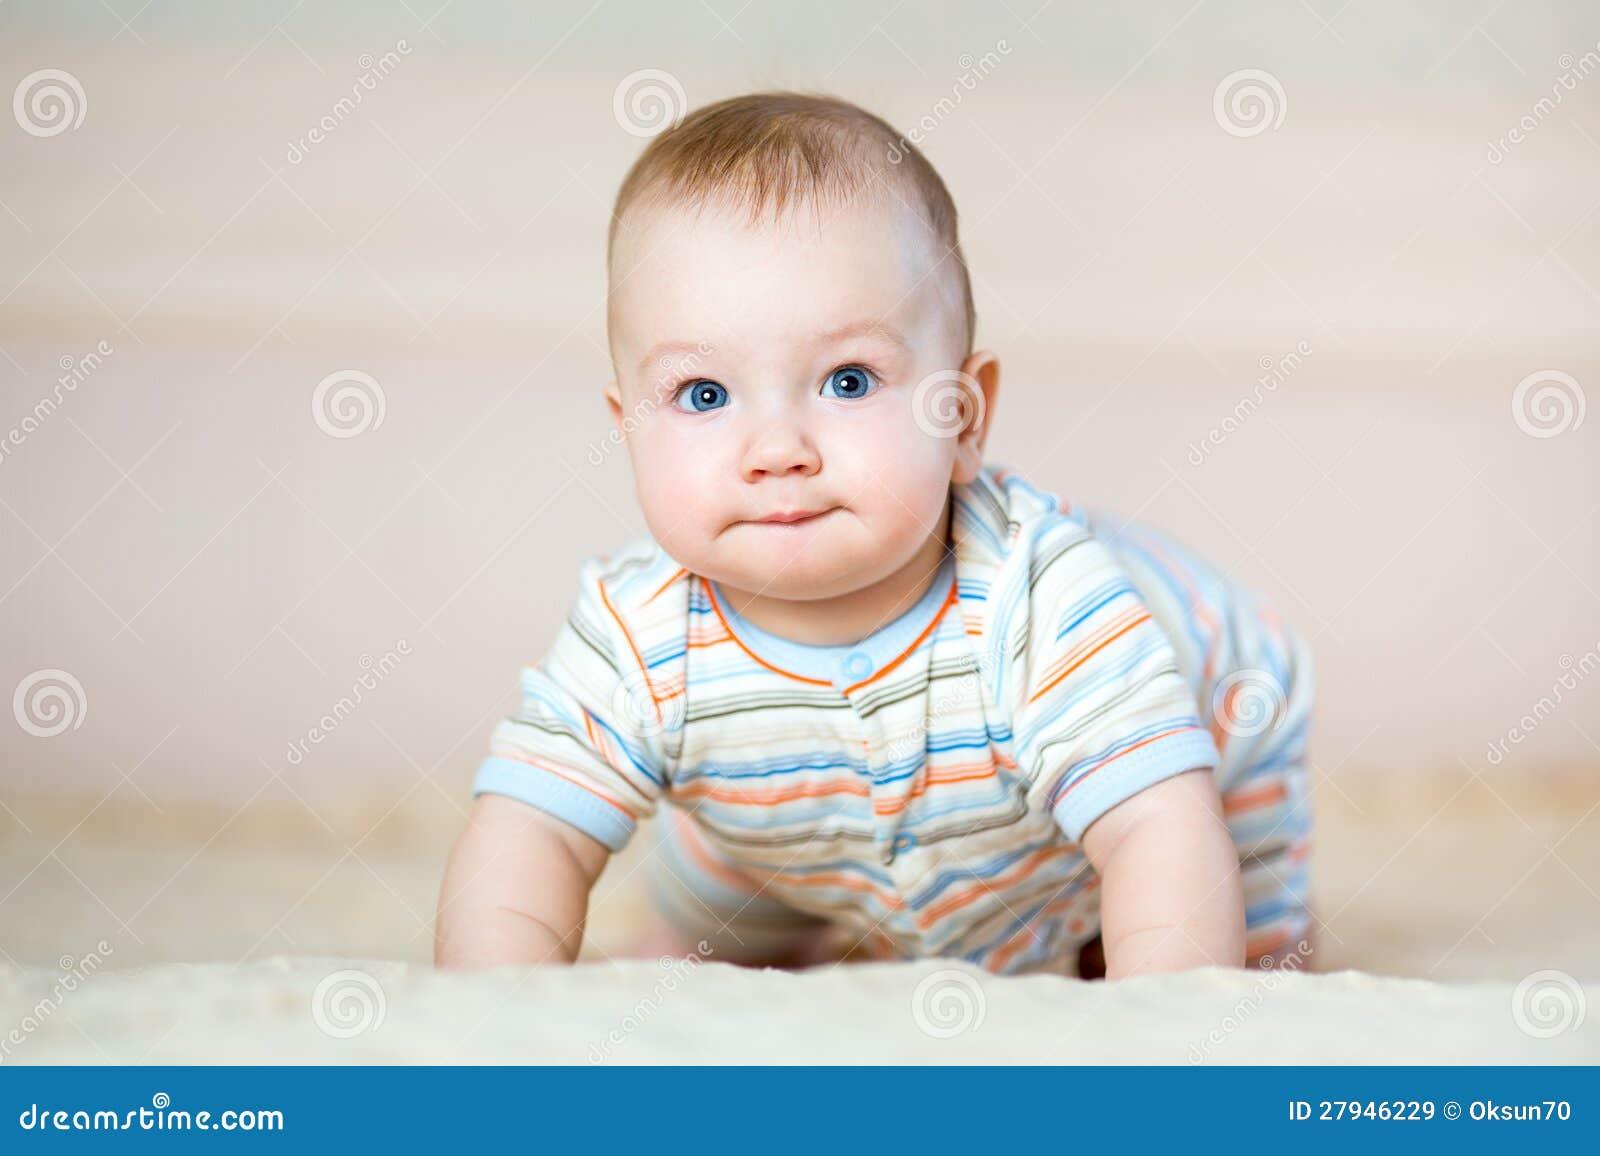 Adorable crawling baby boy indoors